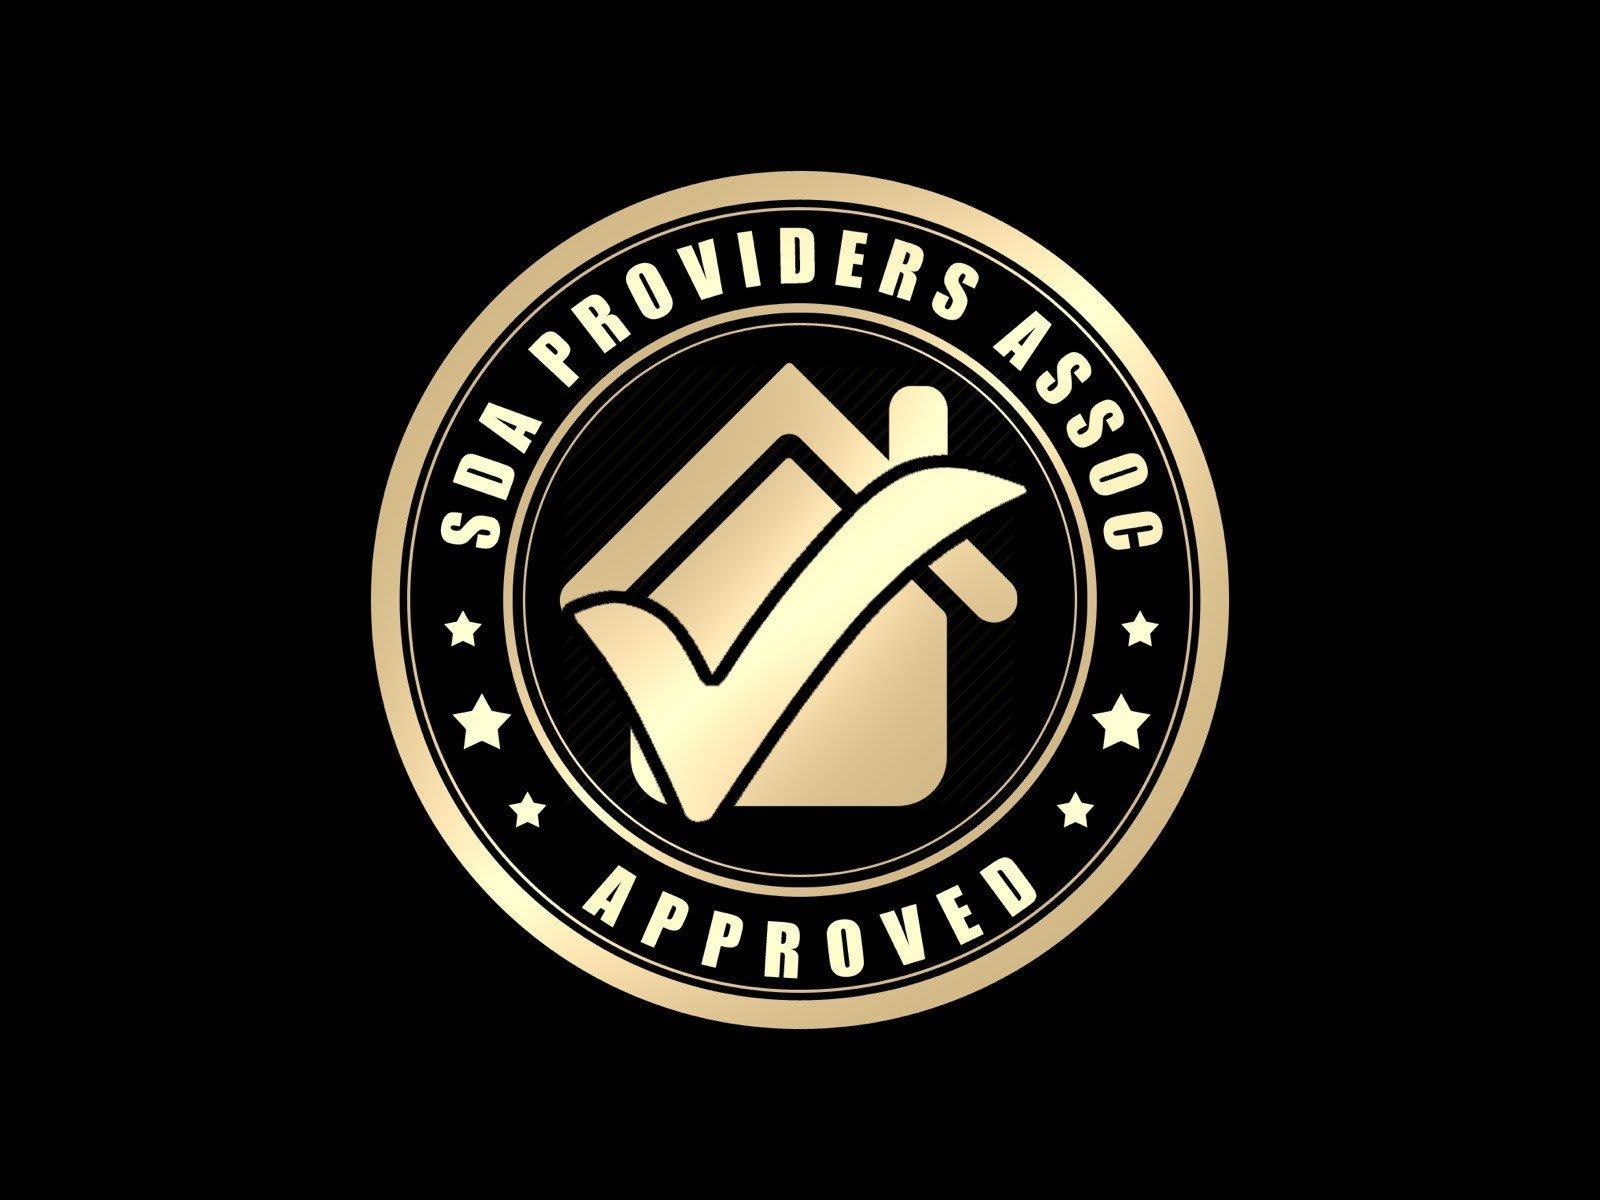 sda providers assoc tick